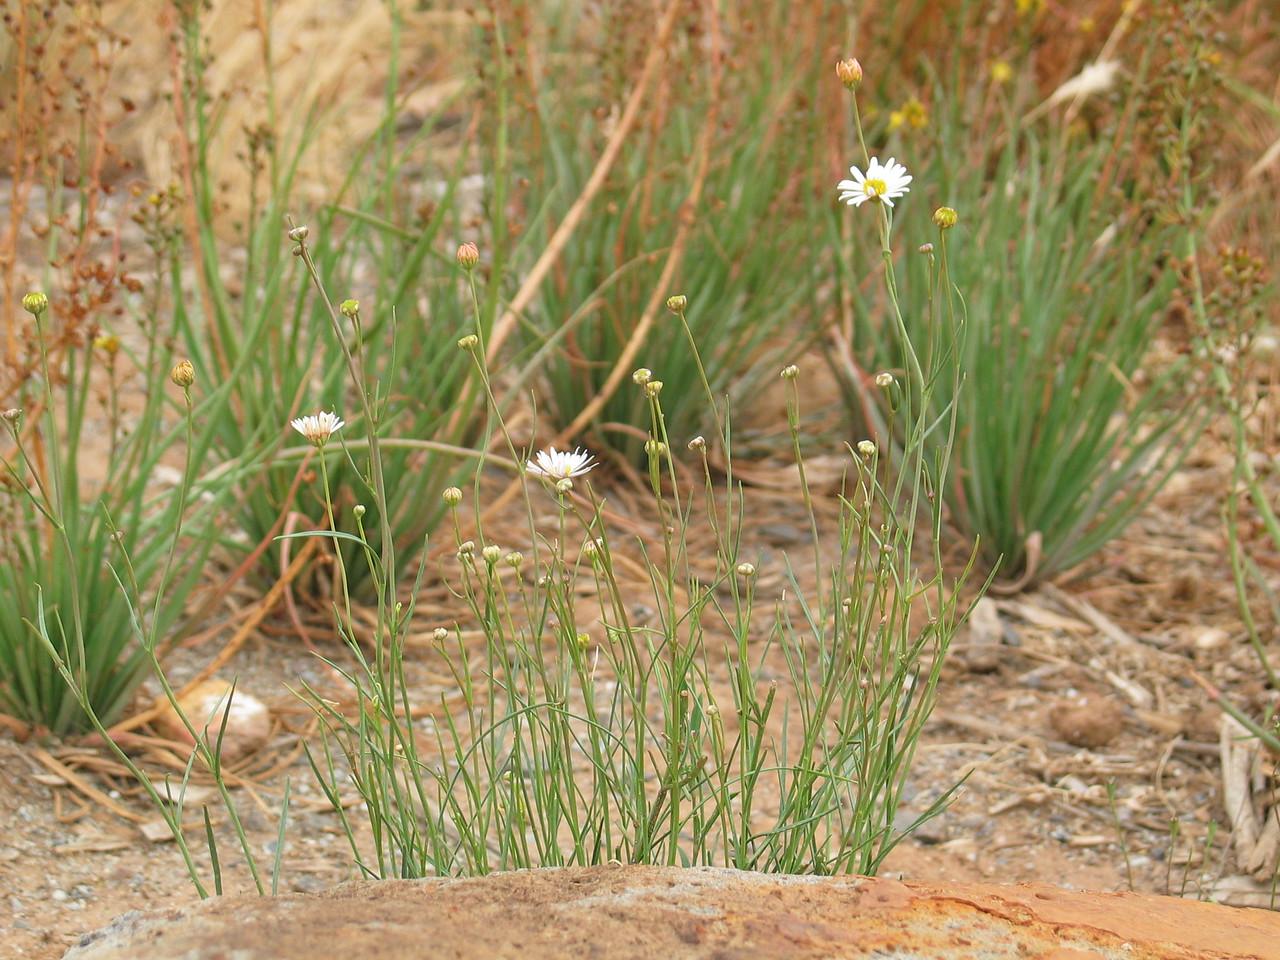 Brachyscome basaltica var. gracilis /Basalt Daisy / Swamp Daisy  Small perennial herb (60cm)